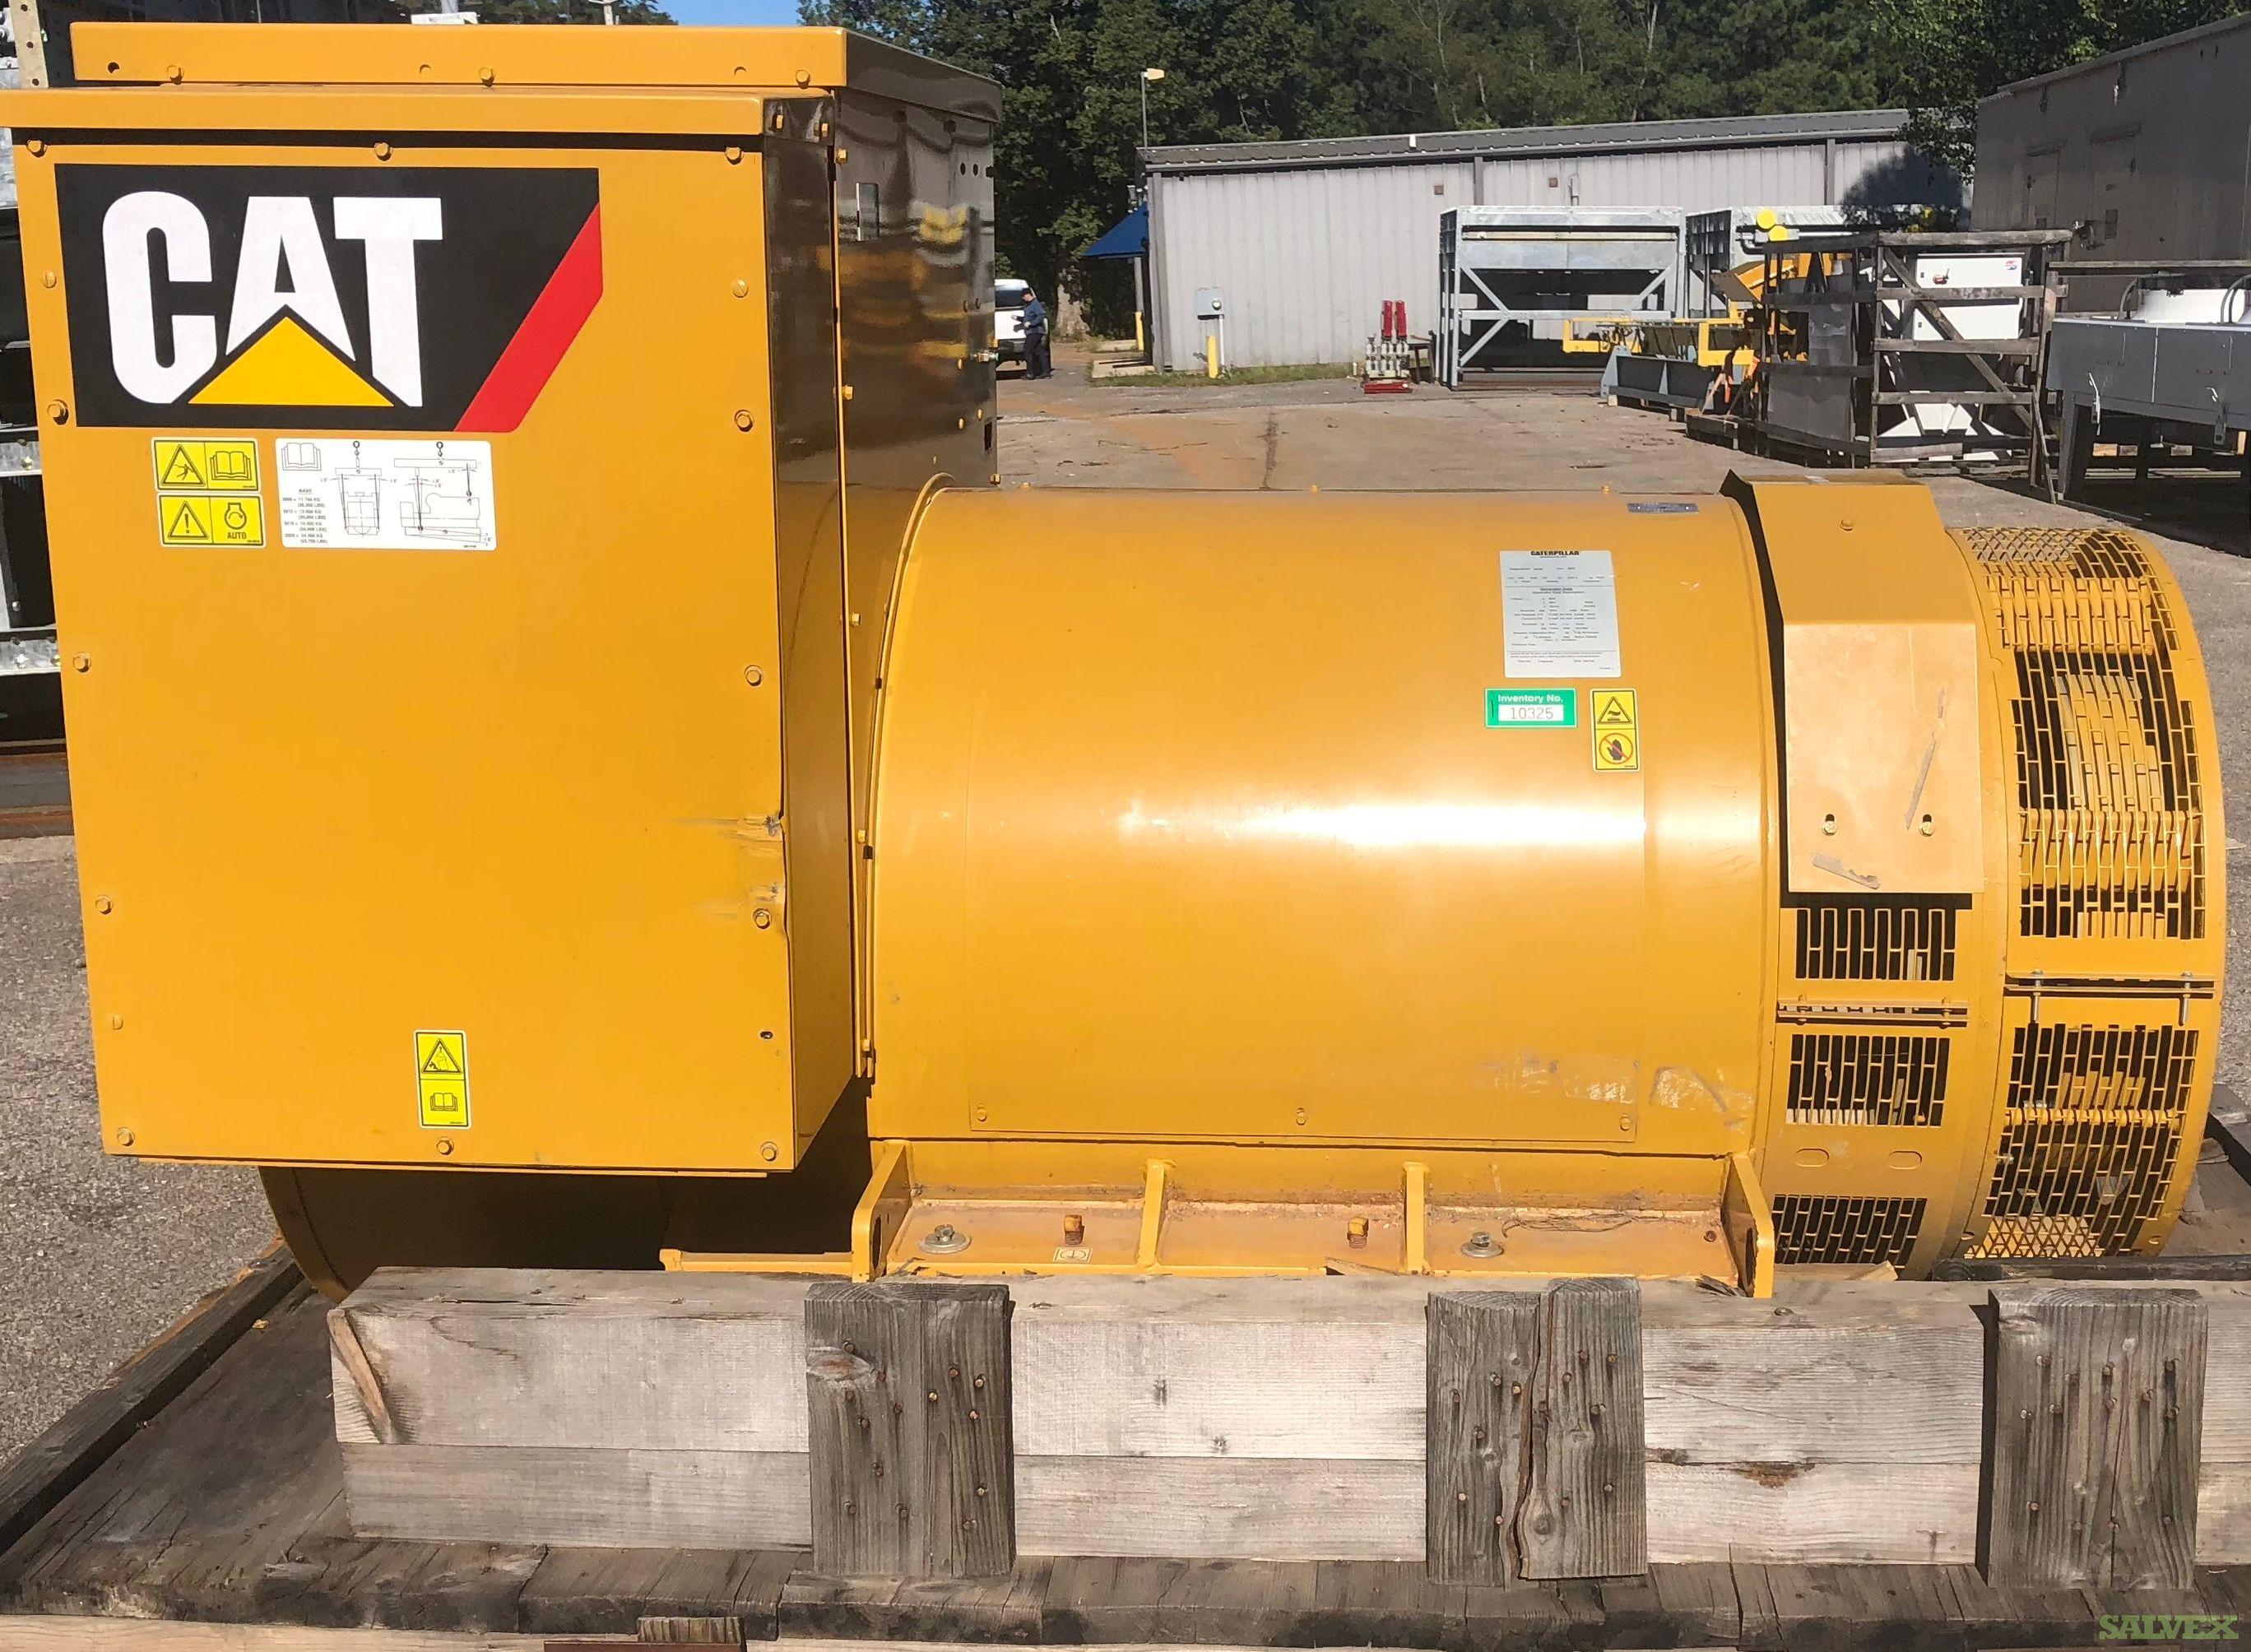 Generator End Caterpillar SR4B 600V, 1.649 Amps, PMG, 826 Frame, 1500RPM, Alternator (Unused)